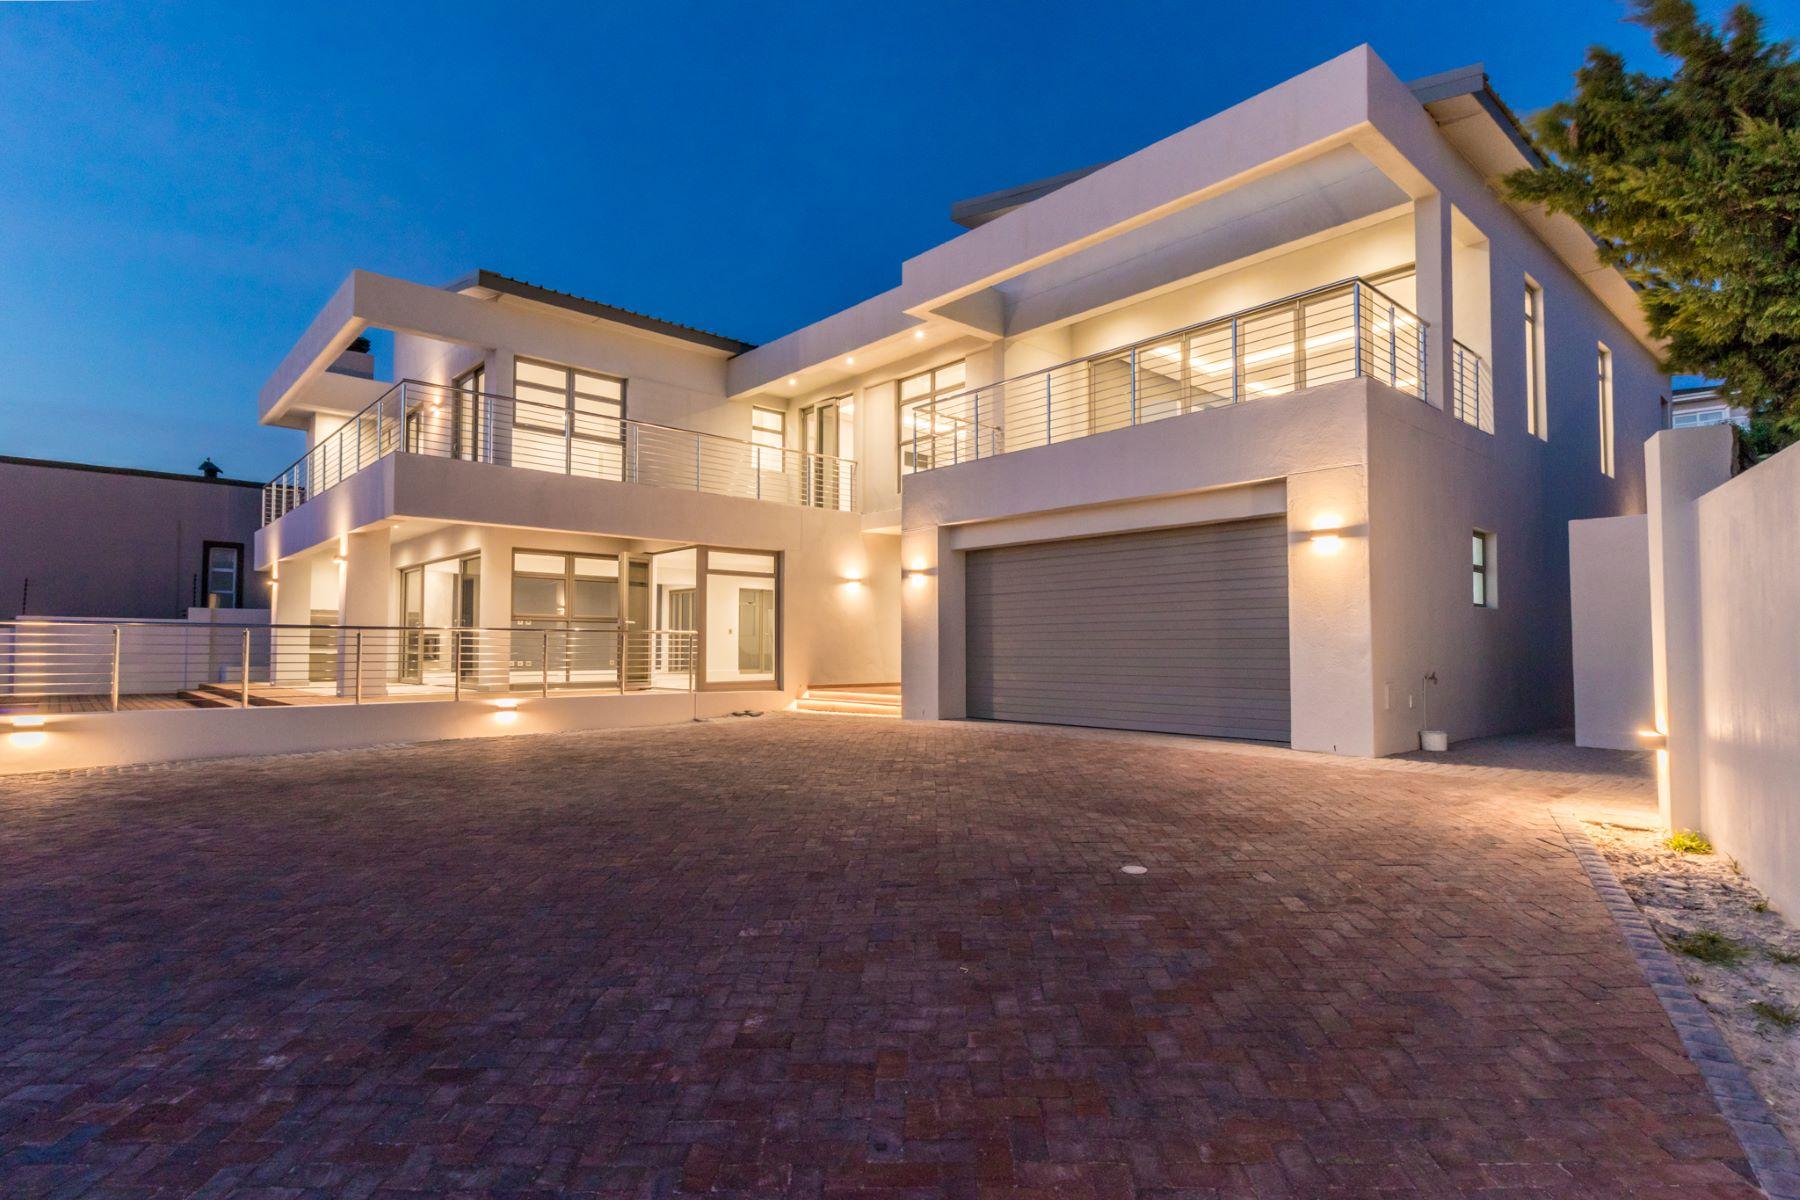 Single Family Homes por un Venta en 4 Bedroom House For Sale in Dennegeur Somerset West, Provincia Occidental Del Cabo Sudáfrica